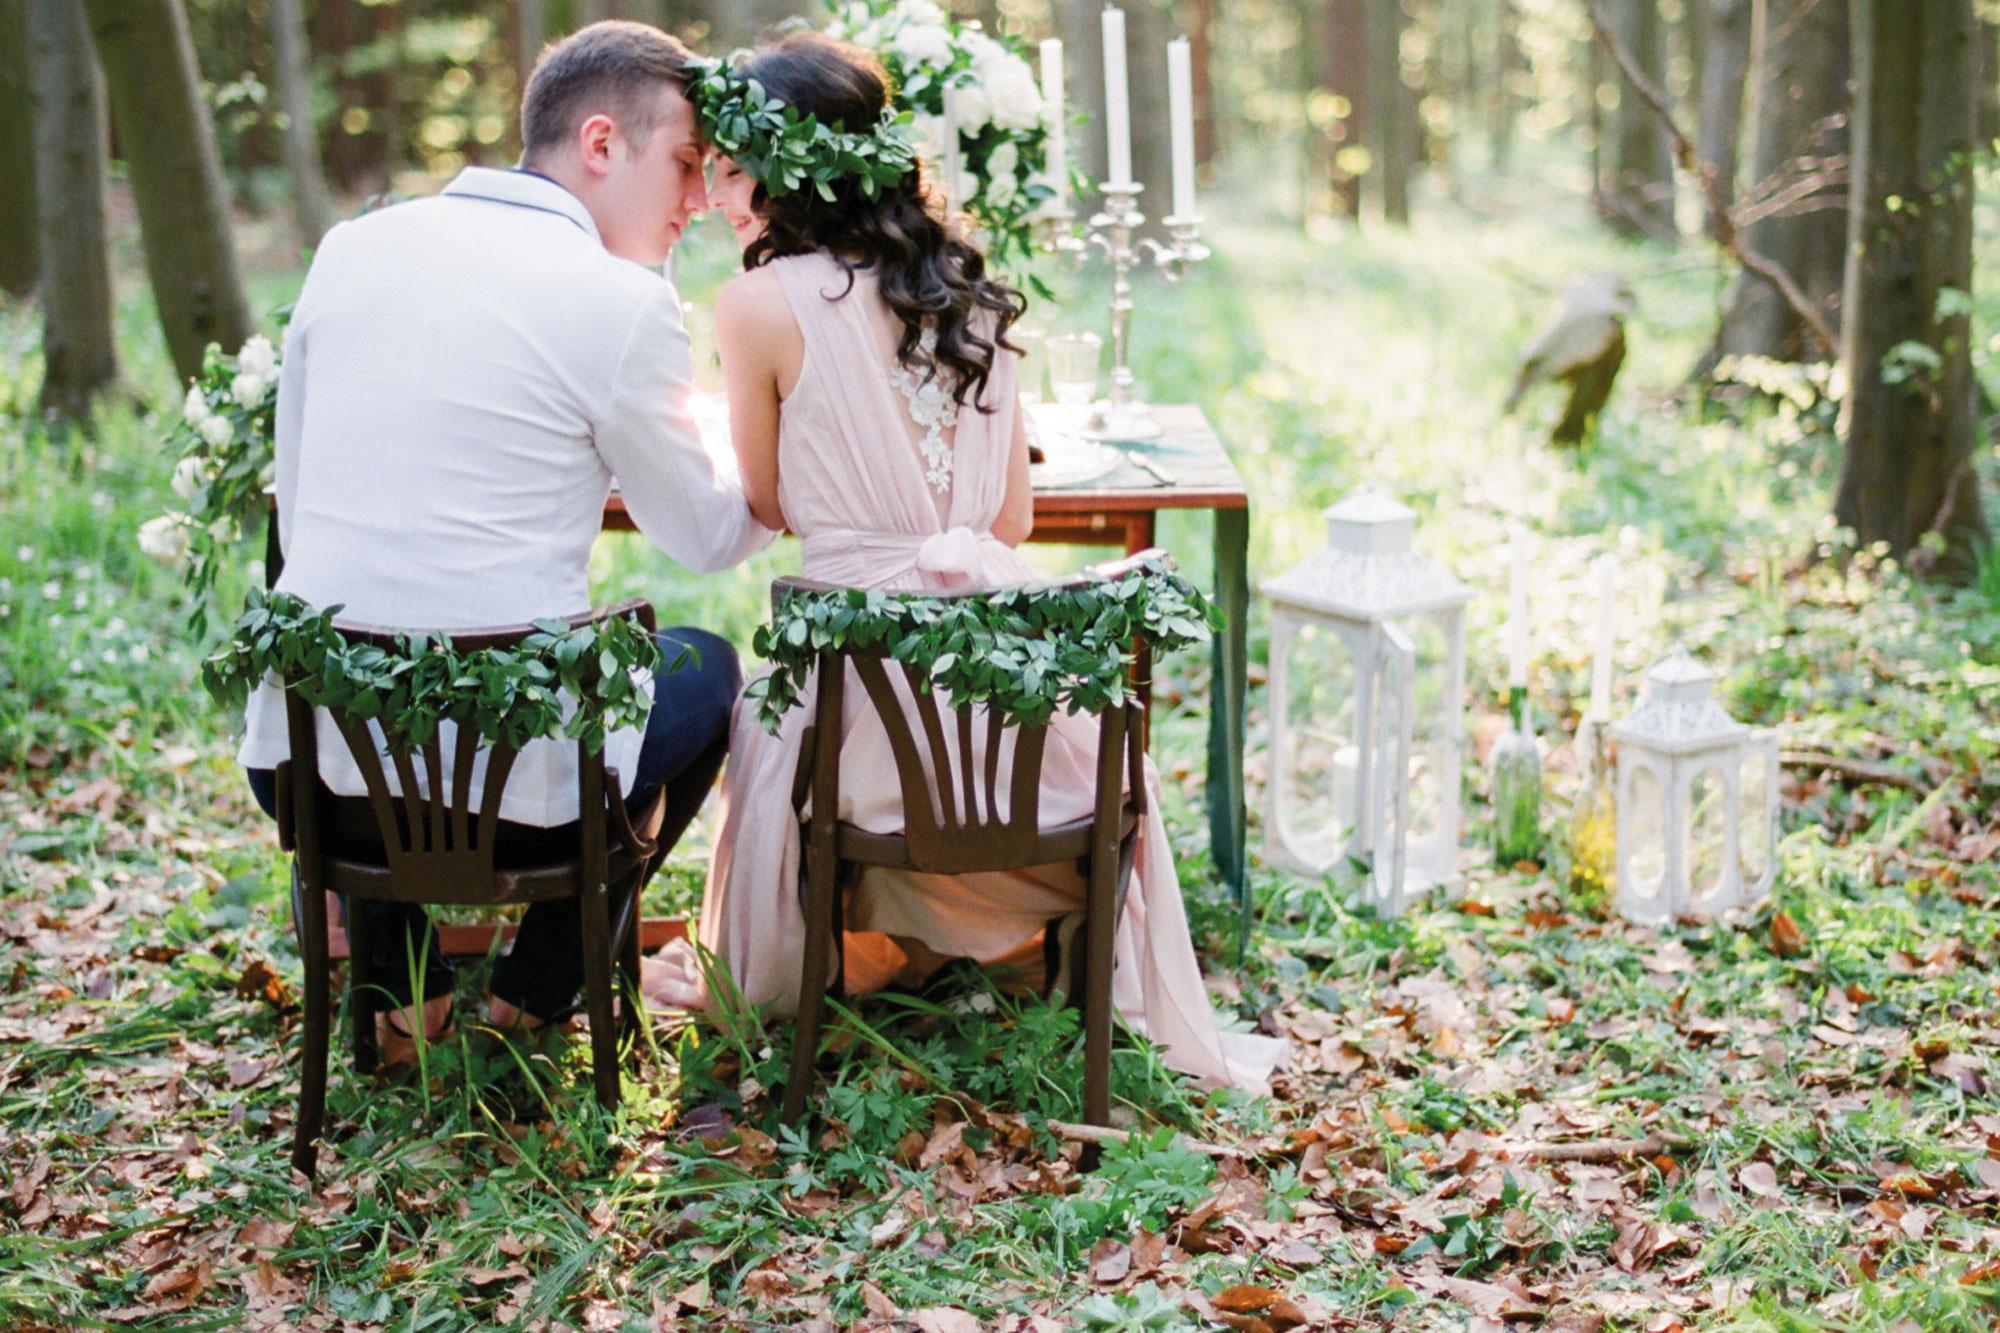 Highands wedding planner